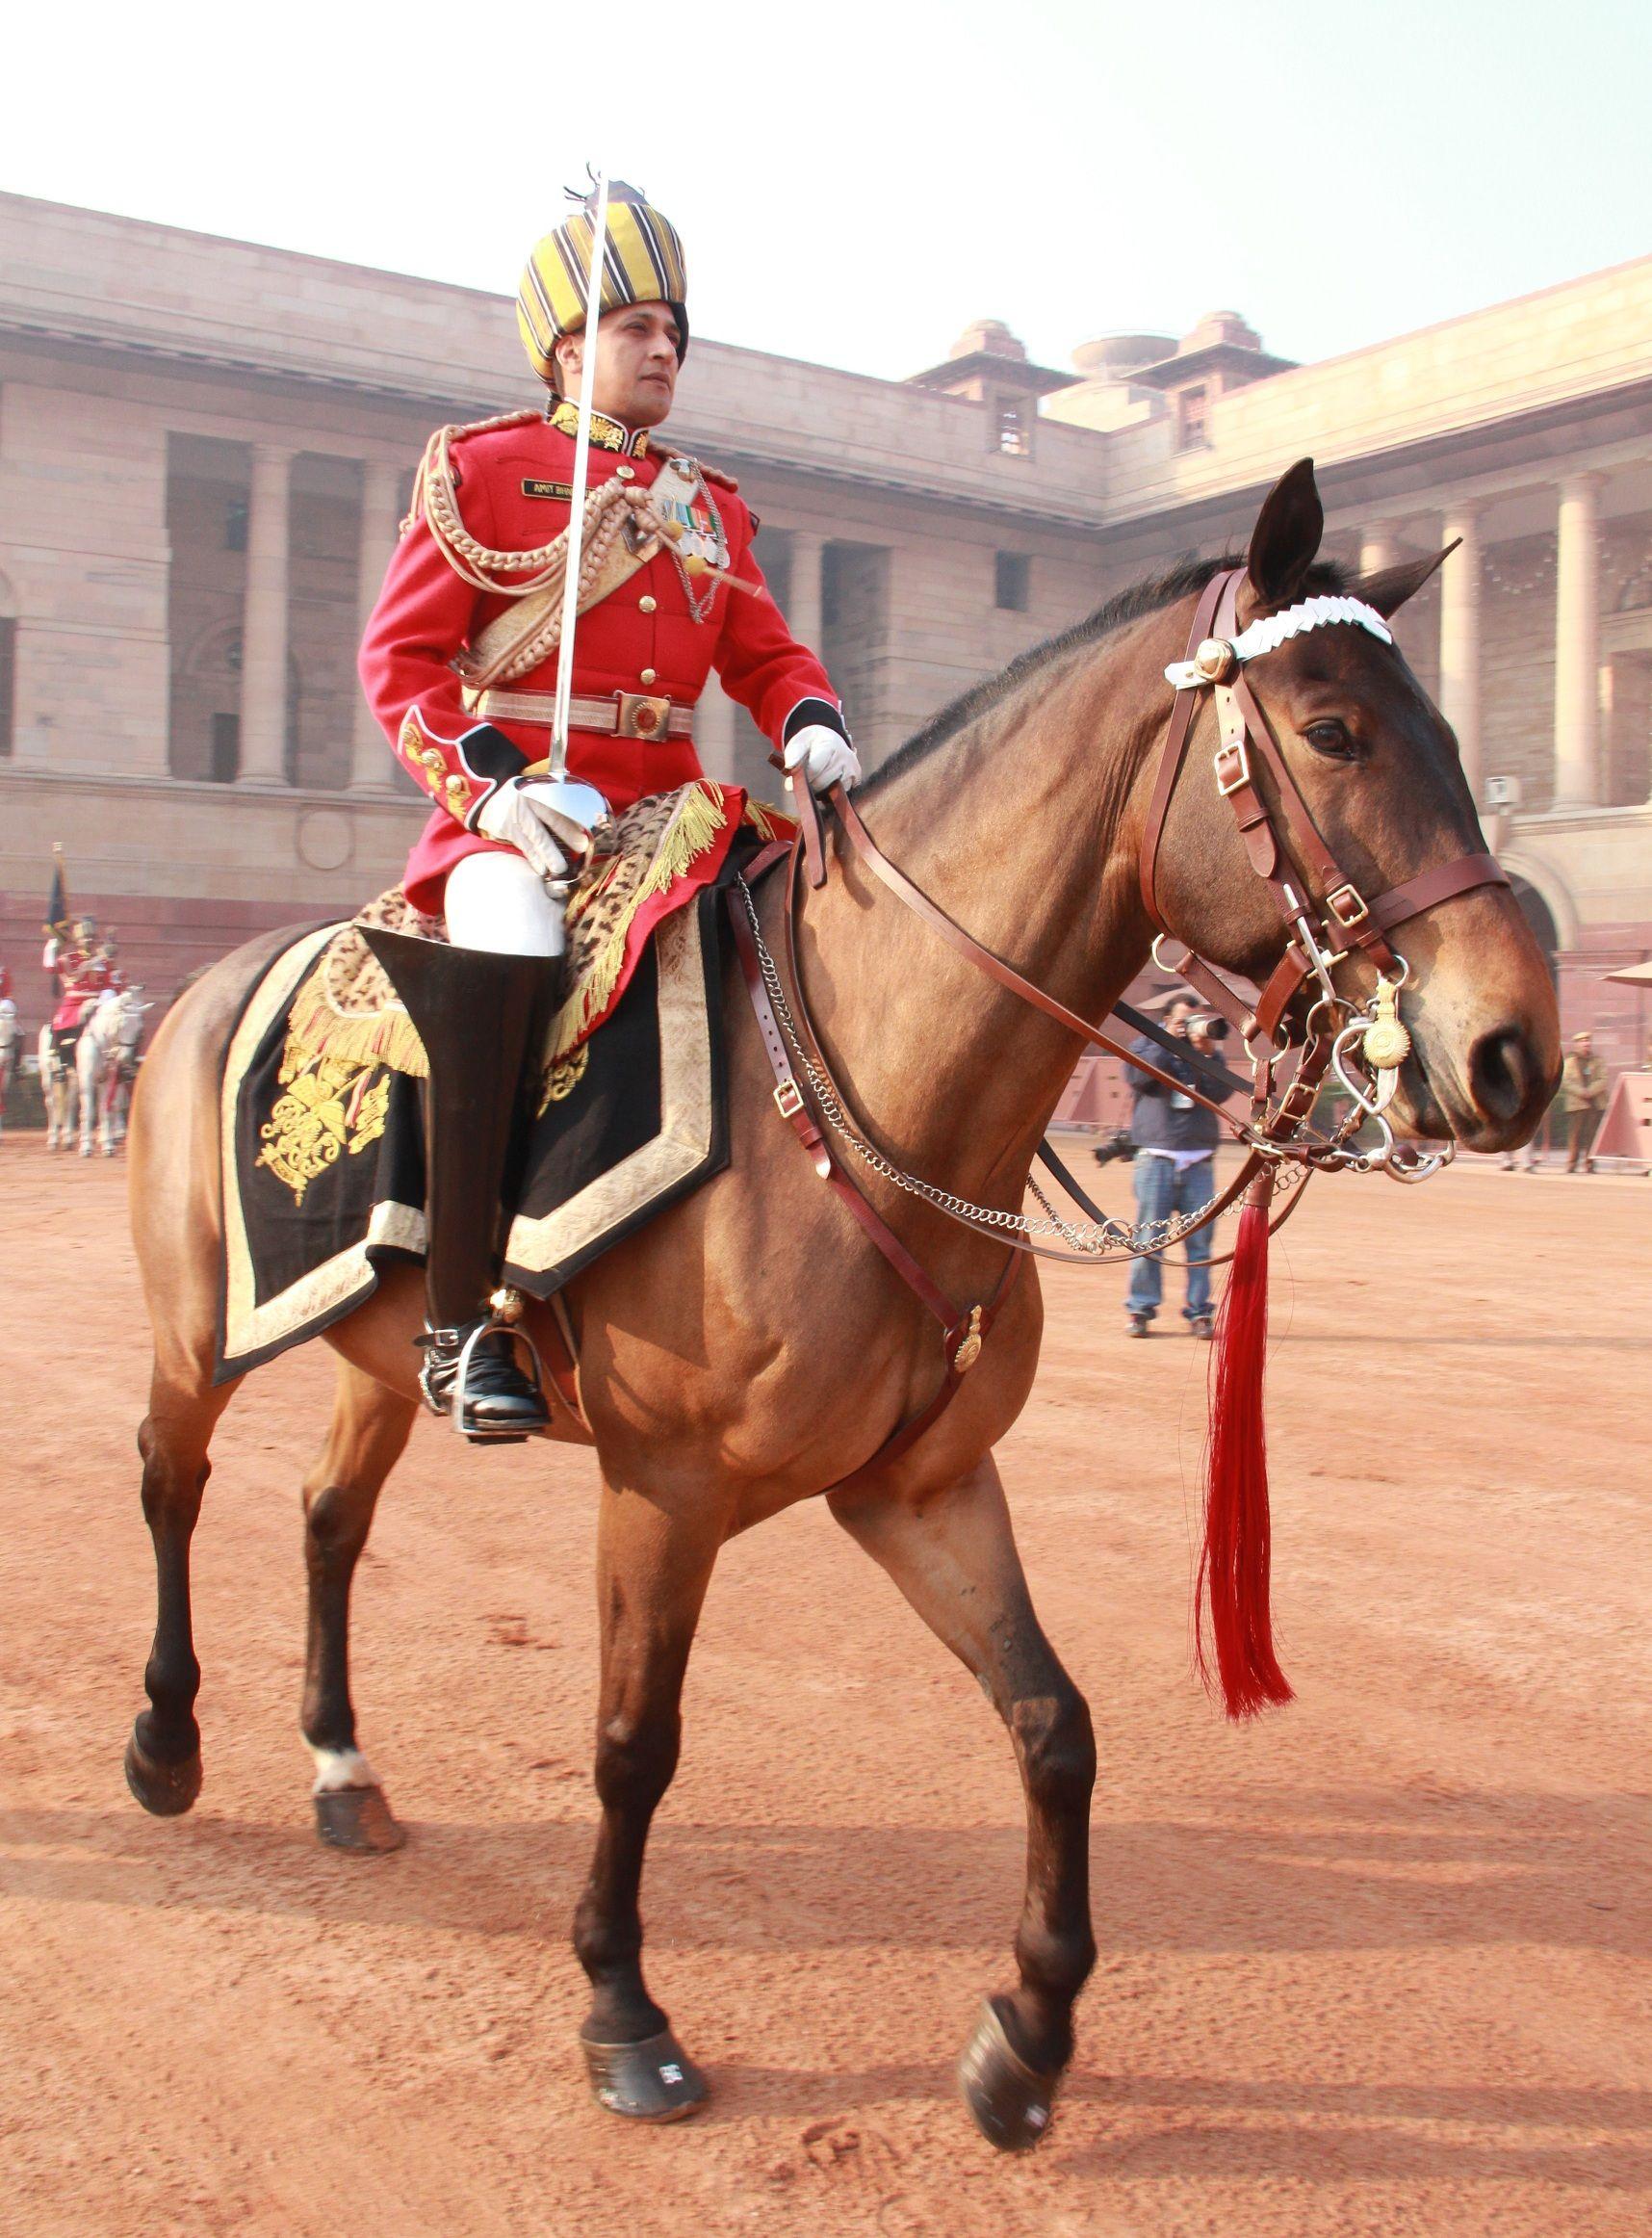 Indian Mounted President's Bodyguard (PBG) in ceremonial uniform [1716x2324]